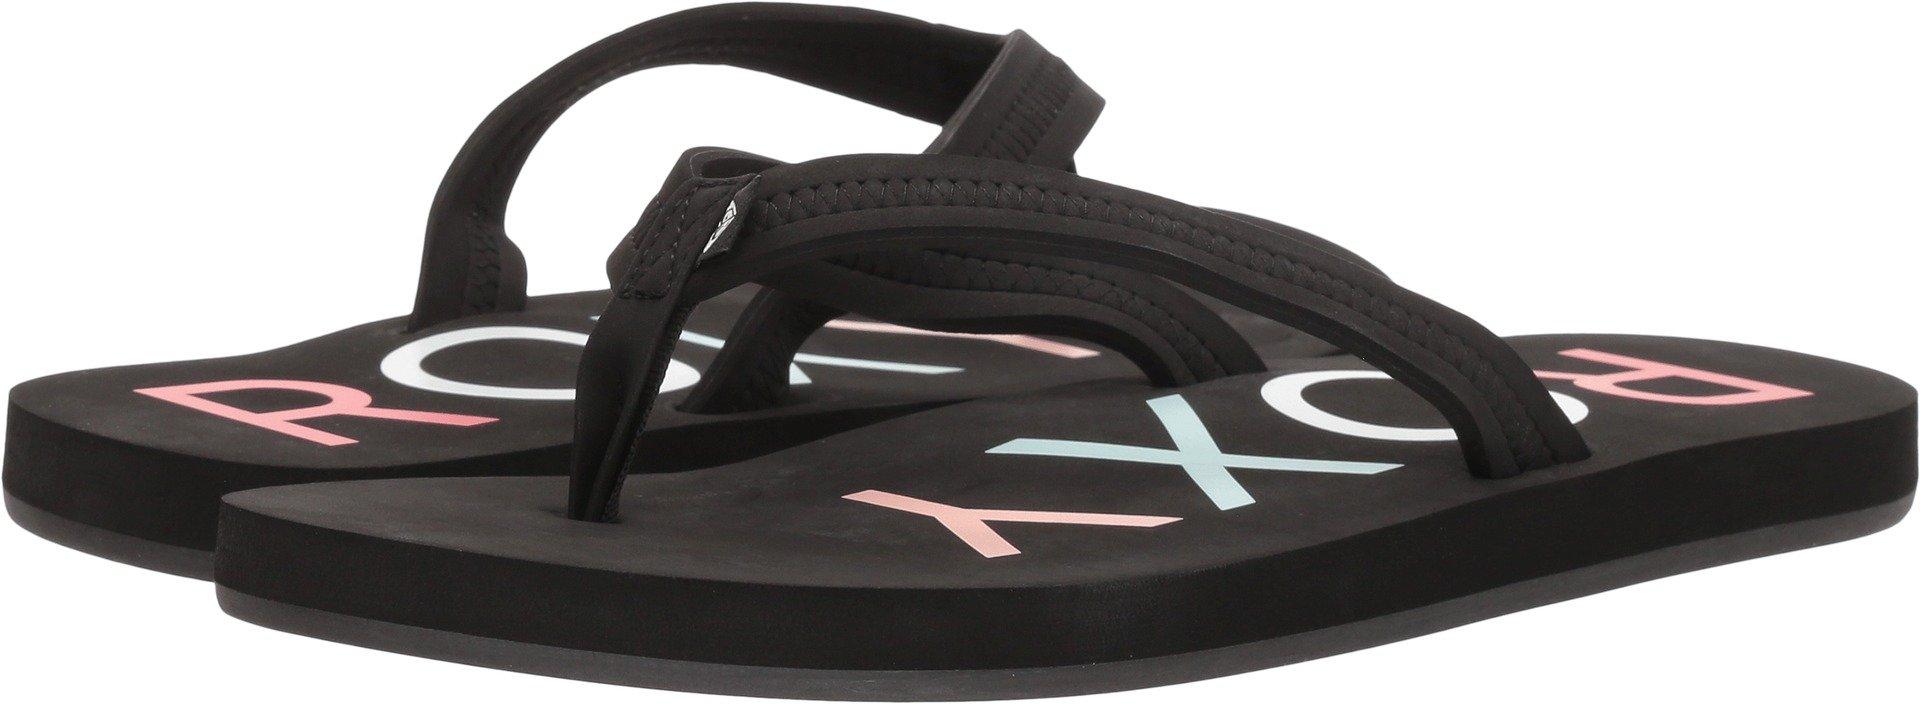 Roxy Women's Vista Sandal Flip-Flop, Black New, 9 M US